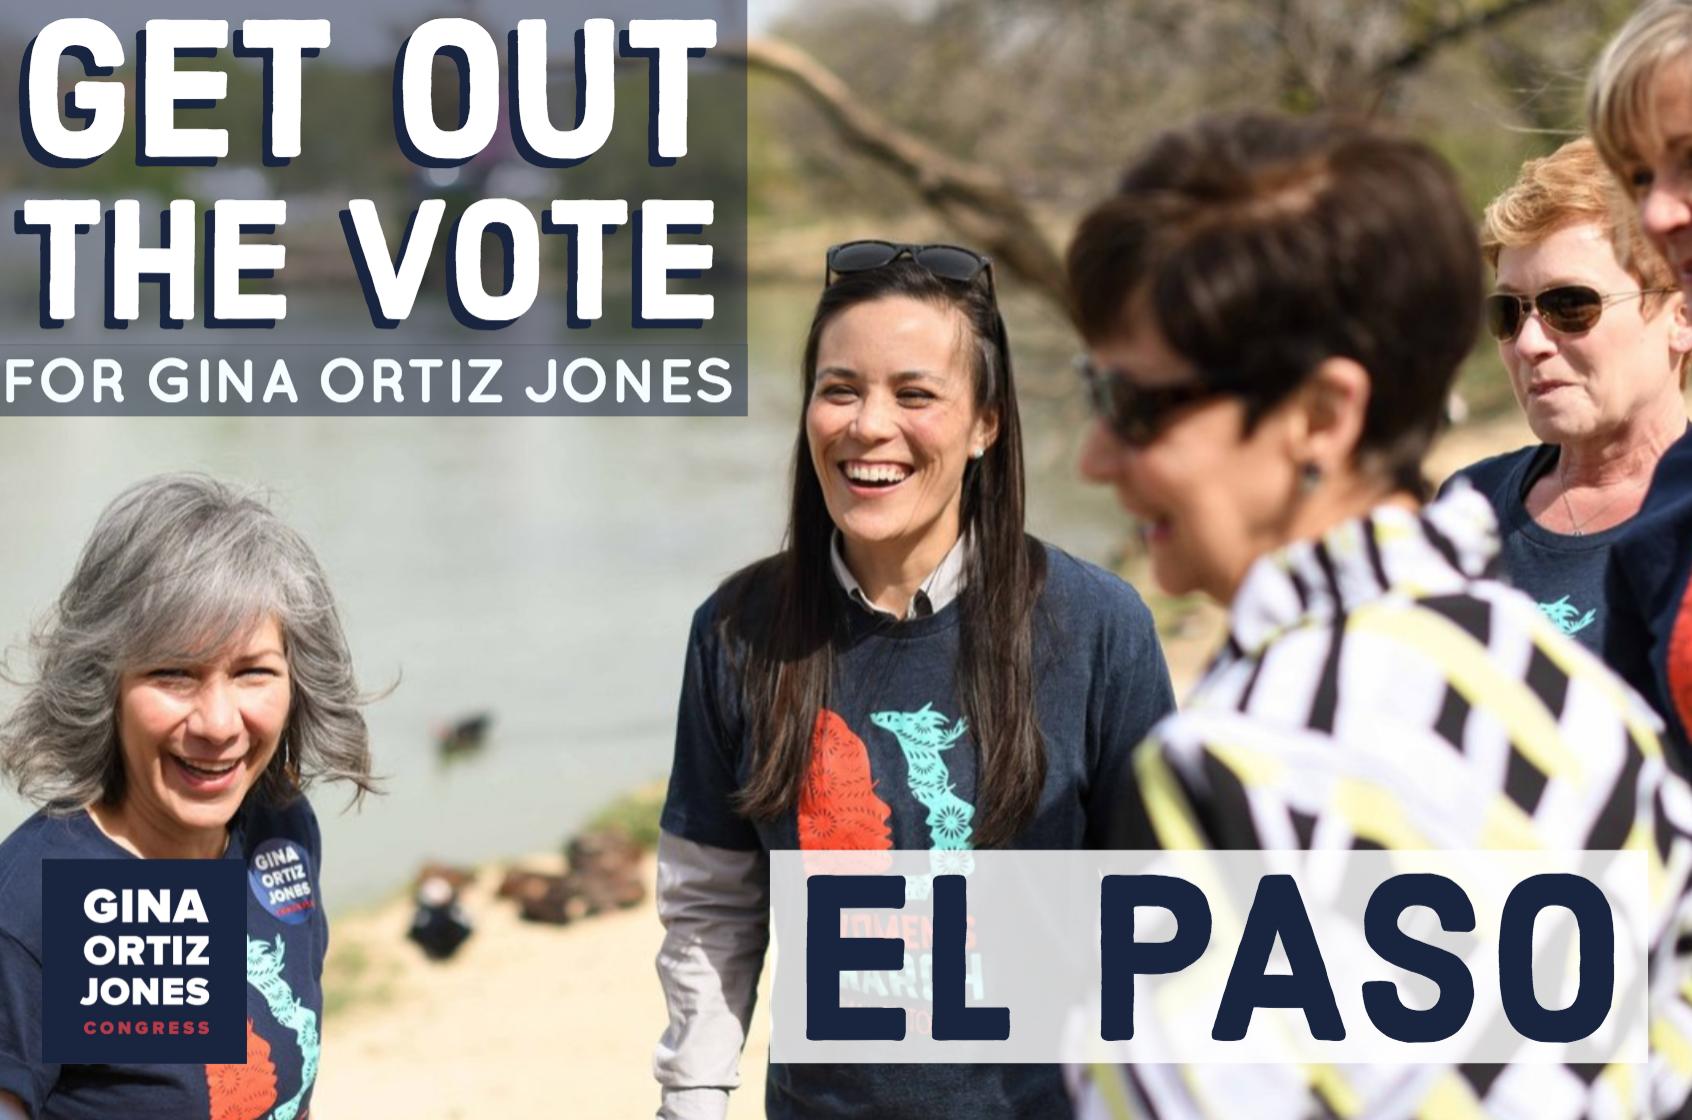 El Paso GOTV Canvass for Gina Ortiz Jones